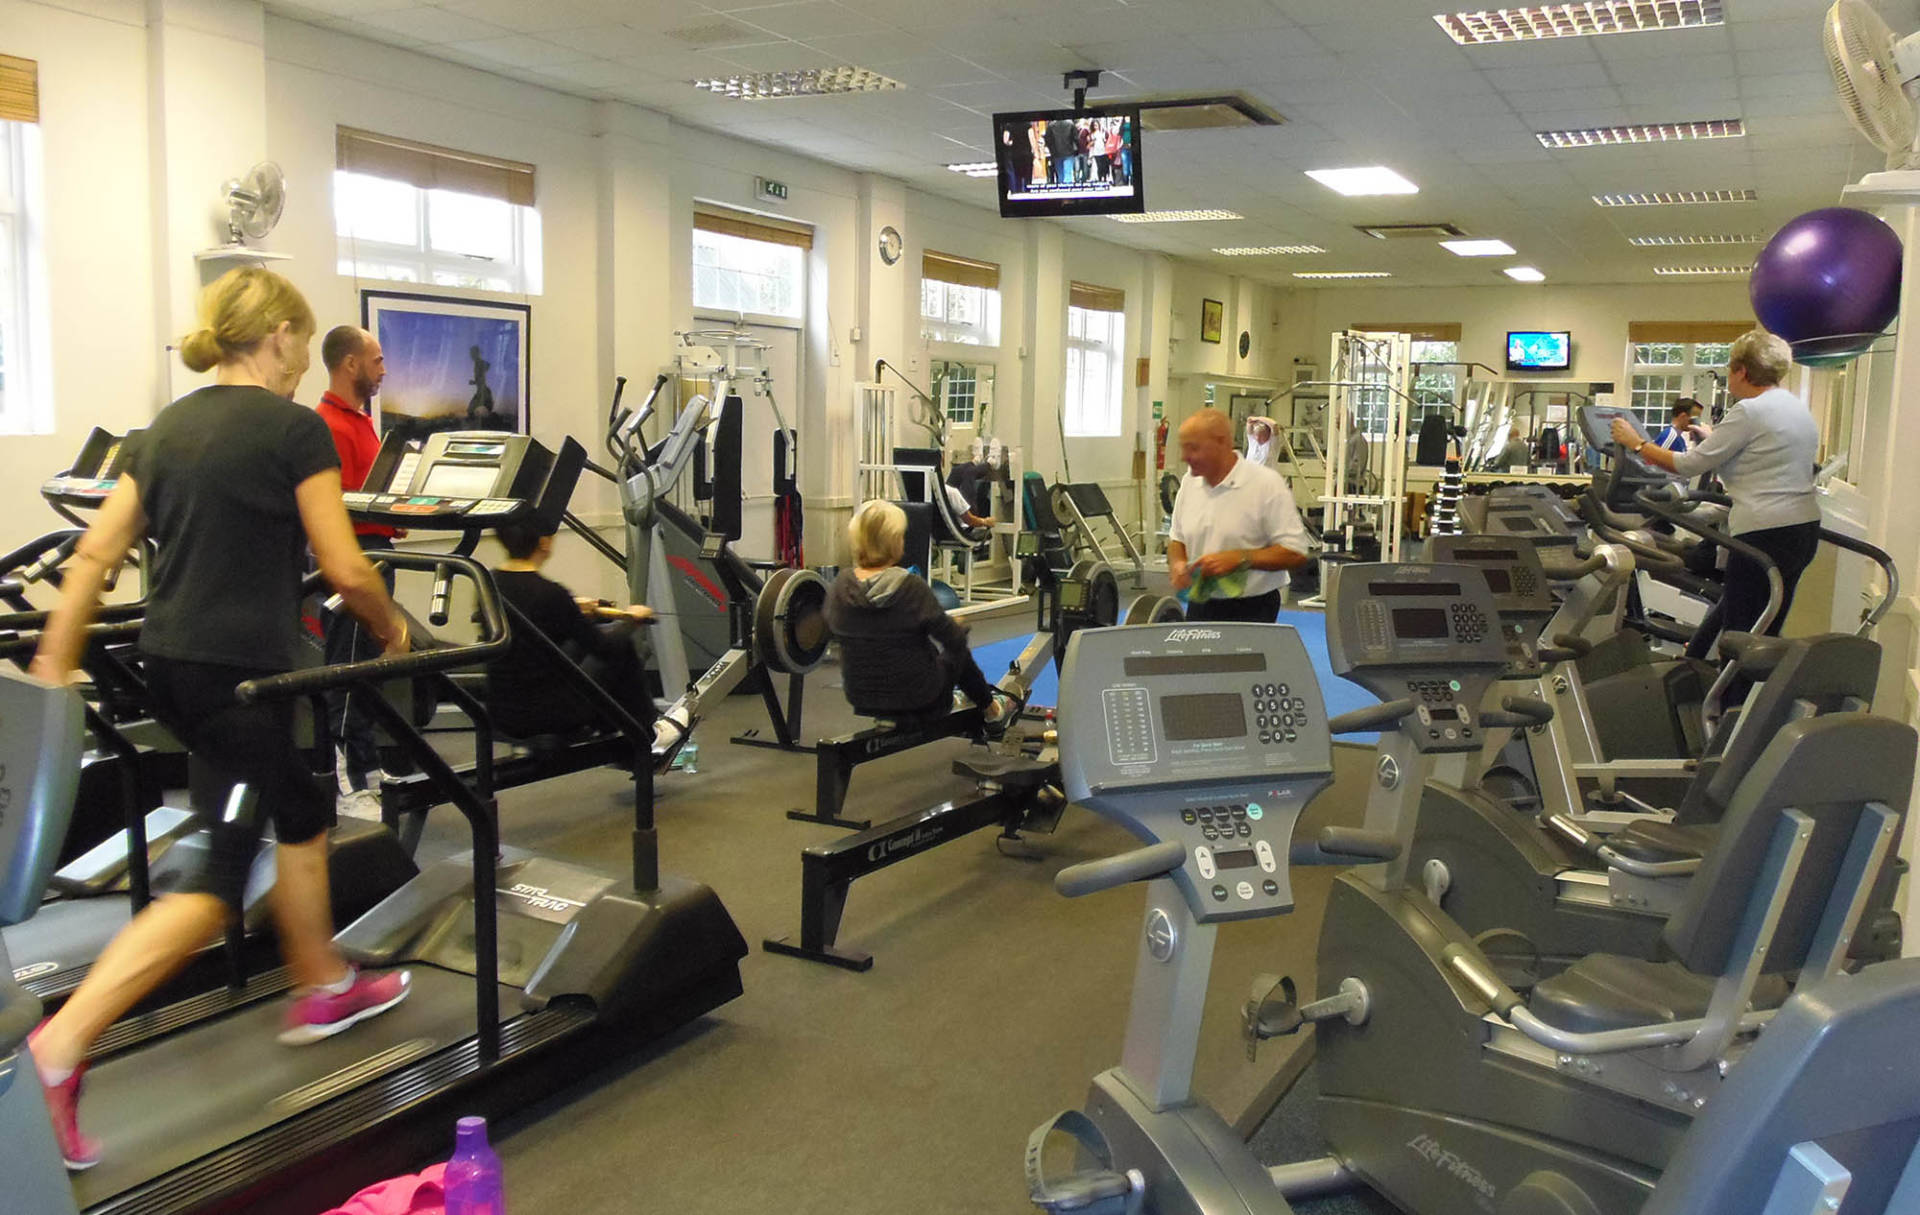 Good-gym-photo.-1